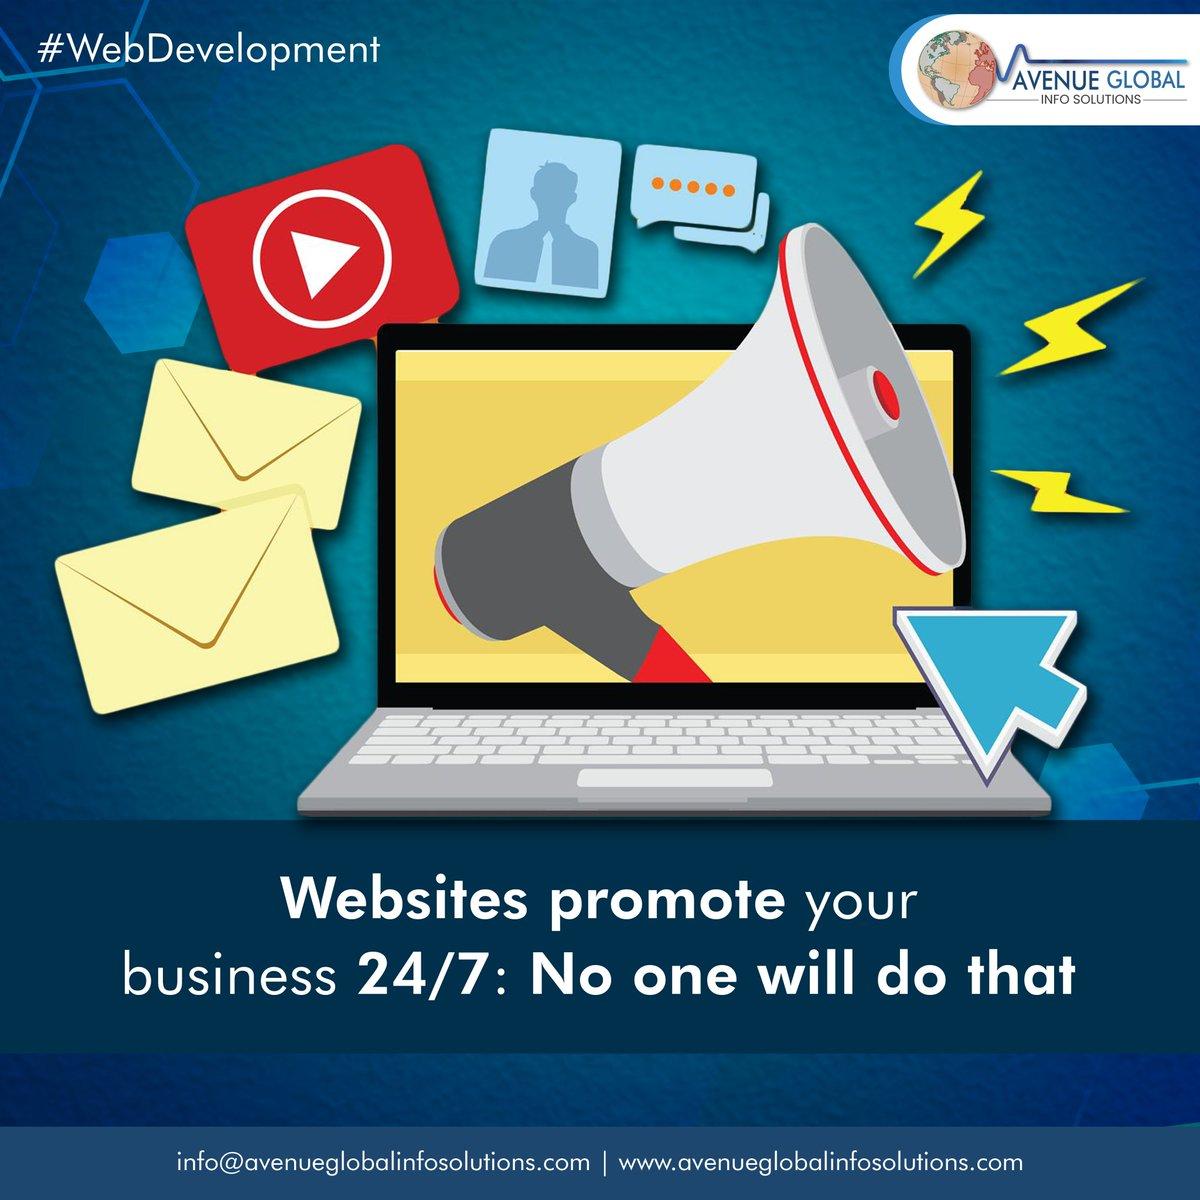 Website Promote your Business 24/7.  #webdesigncompany #websitedeveloper #webdesigntips #instatech #socialmediamarketing  #avenueglobal #AGIS #Webdesigning #Digitalmarketing #SaturdayMotivation #SaturdayThoughts  #Websitedevelopment #websitebuilder #ITcompany #Punepic.twitter.com/dykRUa6FE4